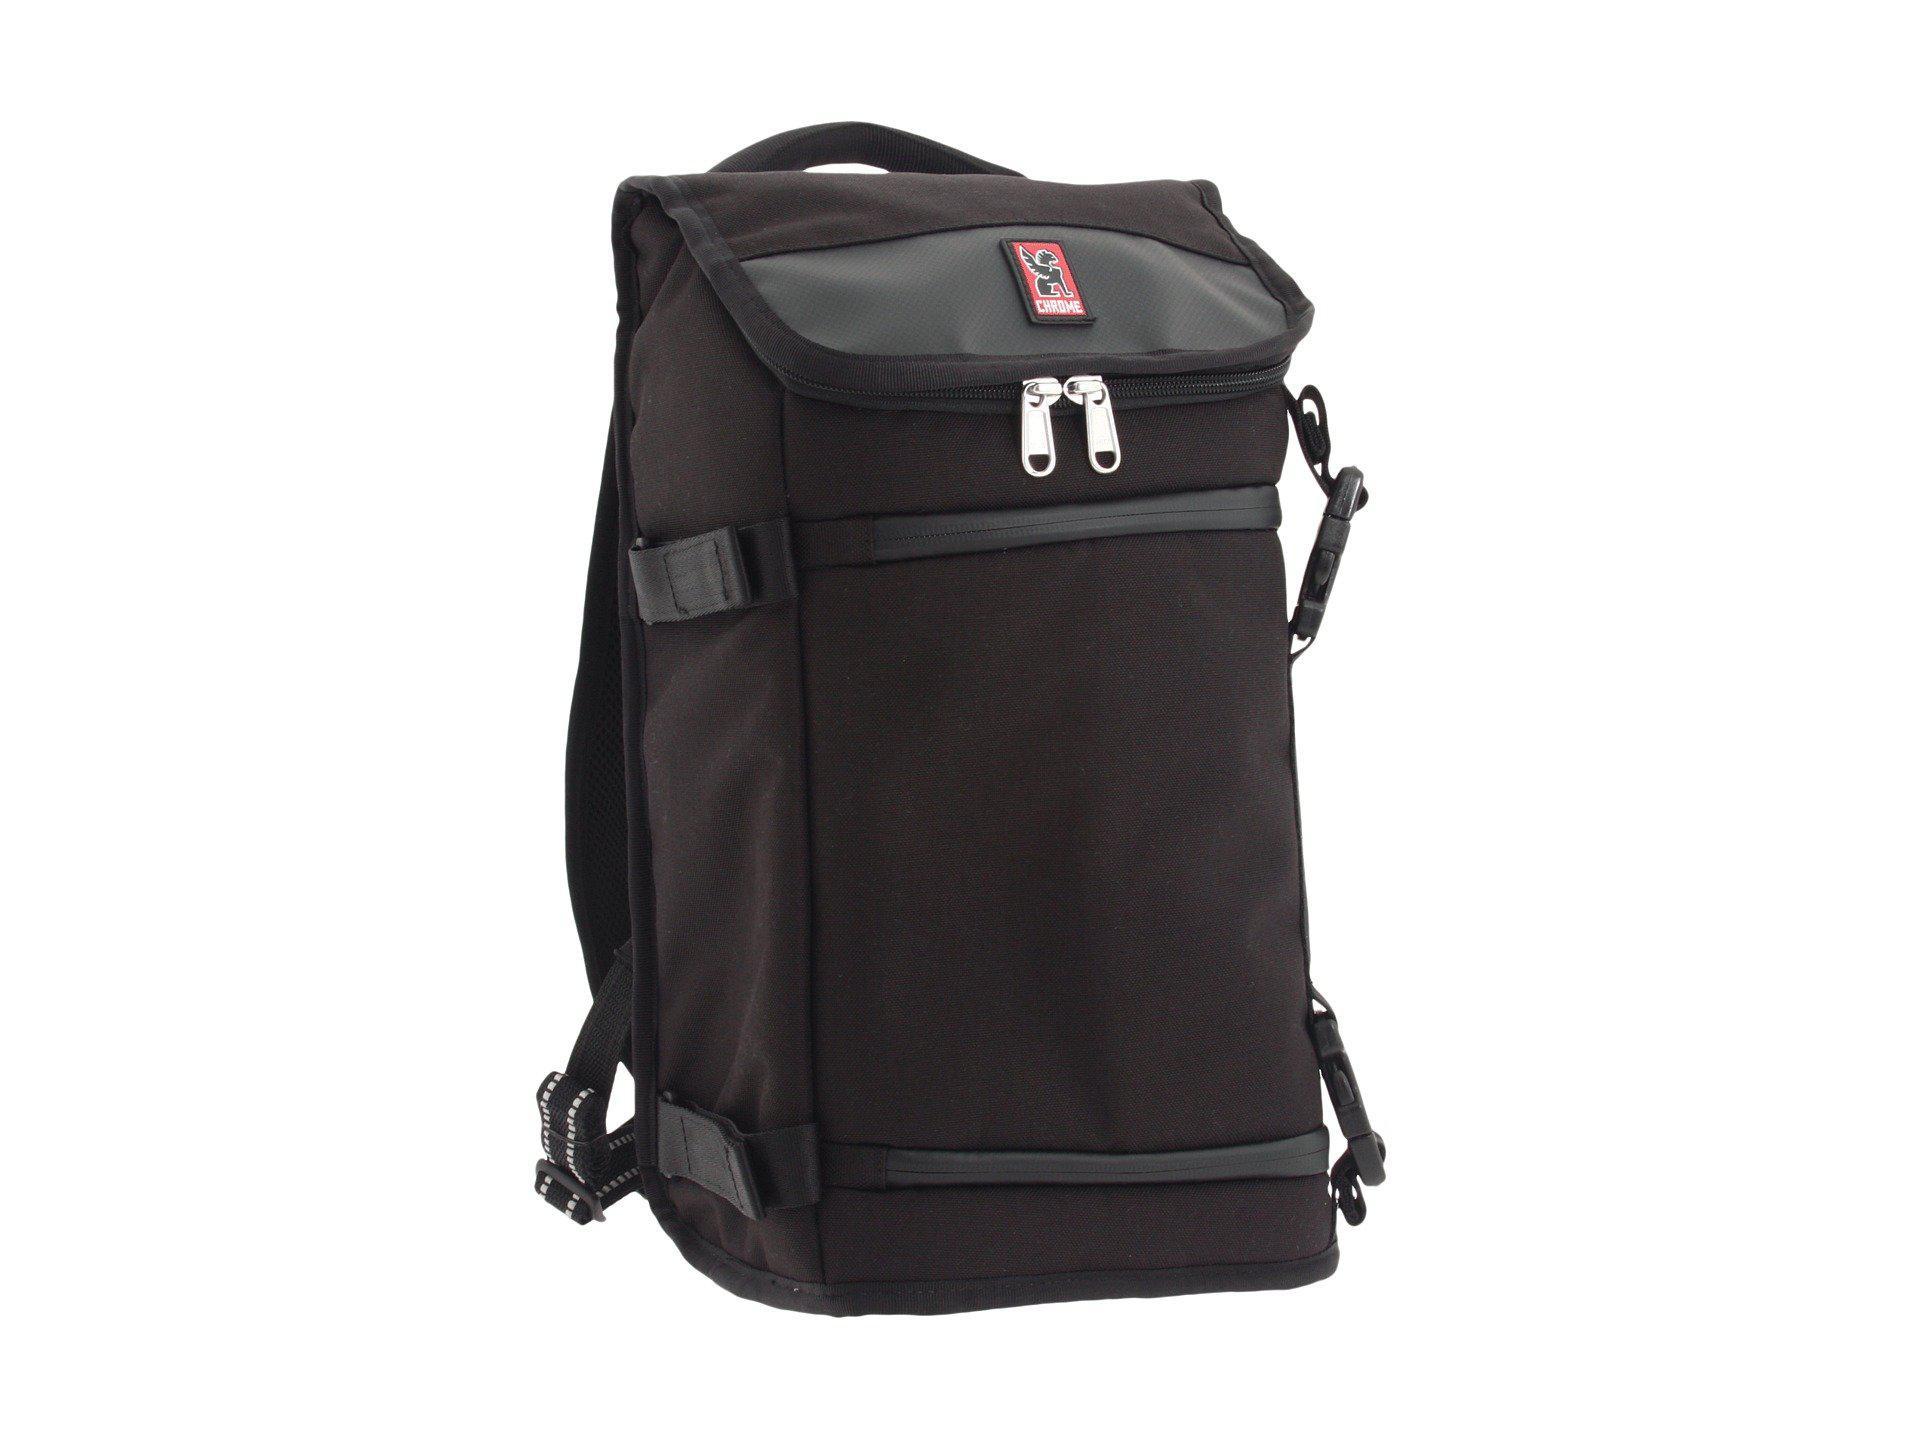 In Chrome For Niko Industries Lyst Bags blackblack Black Men nSqpC6X